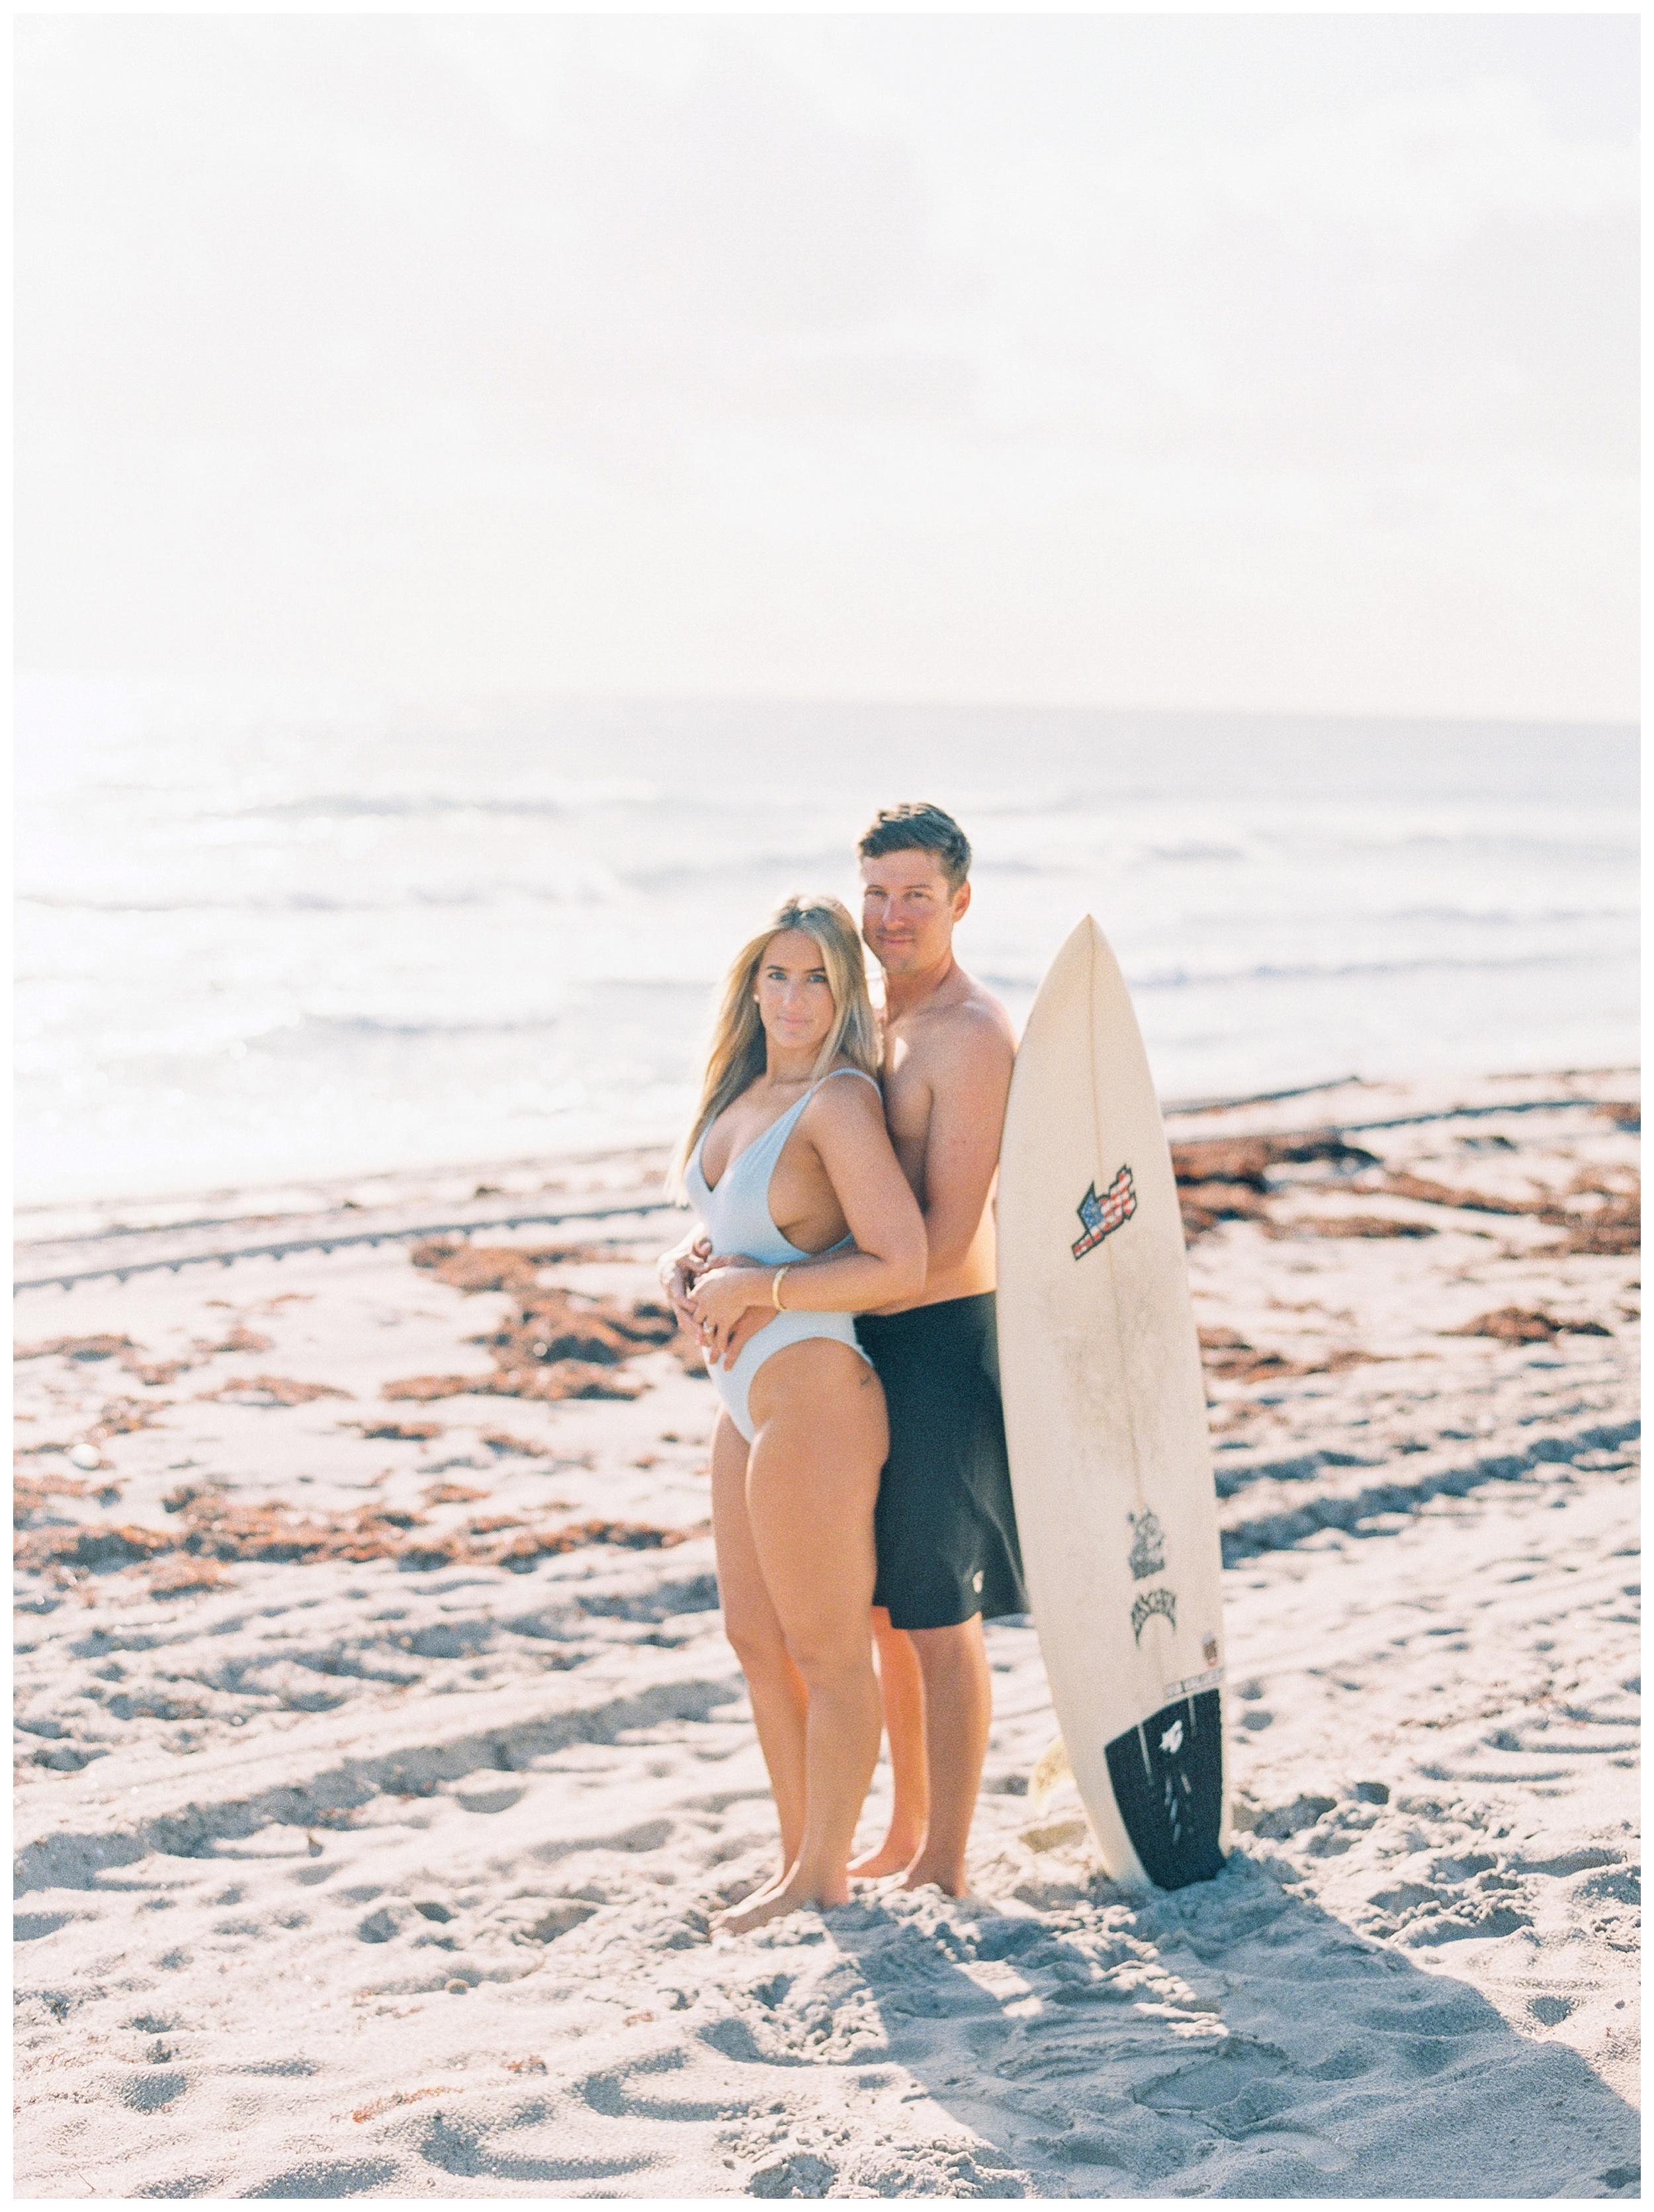 Surfboard Engagement Florida Wedding Photographer Kir Tuben_0033.jpg